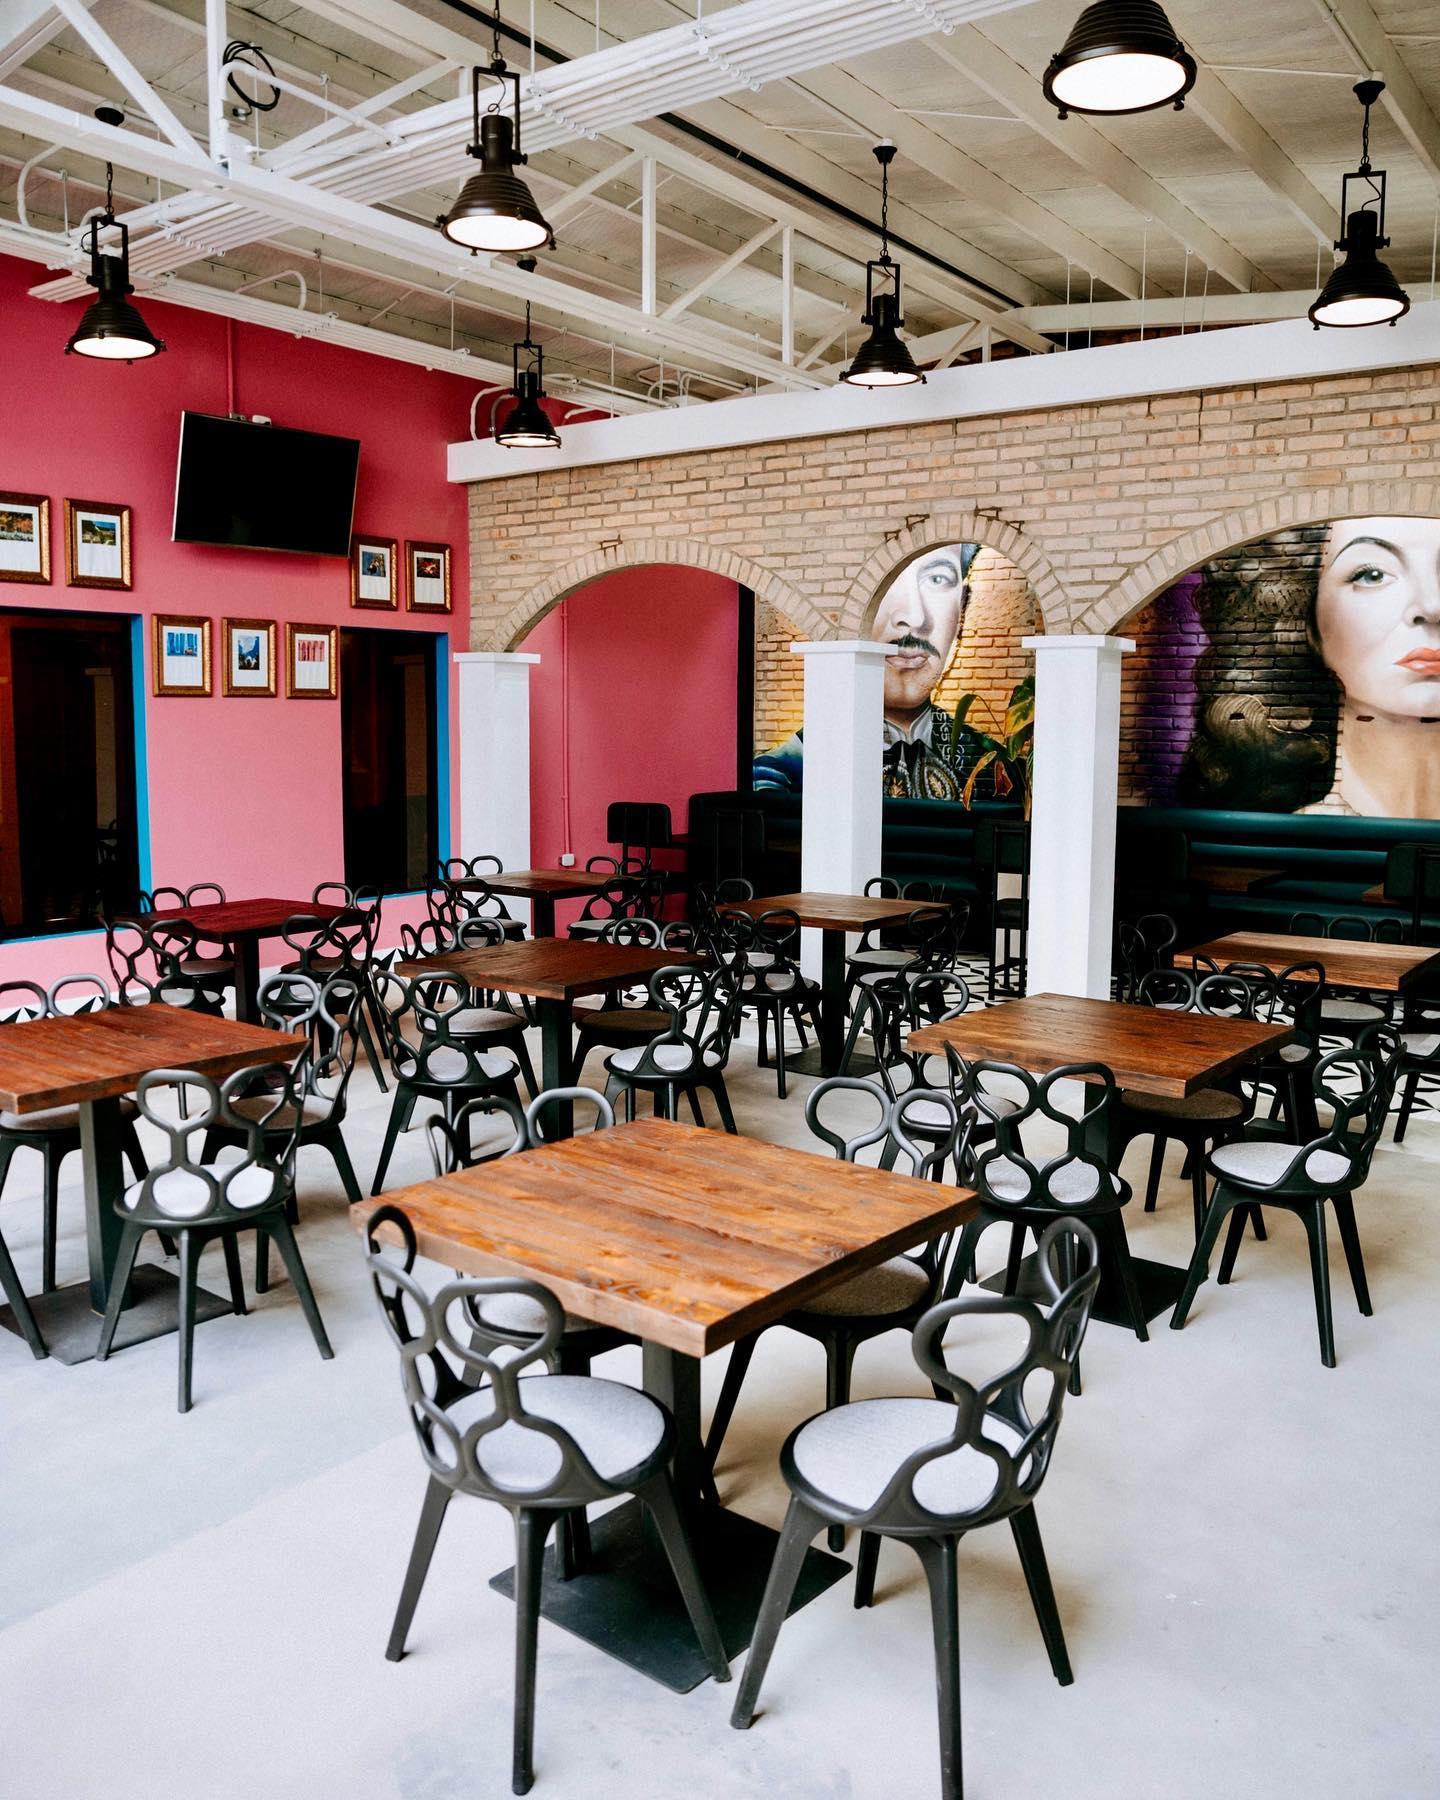 La Catrina, restaurante de cocina mexicana en Honduras